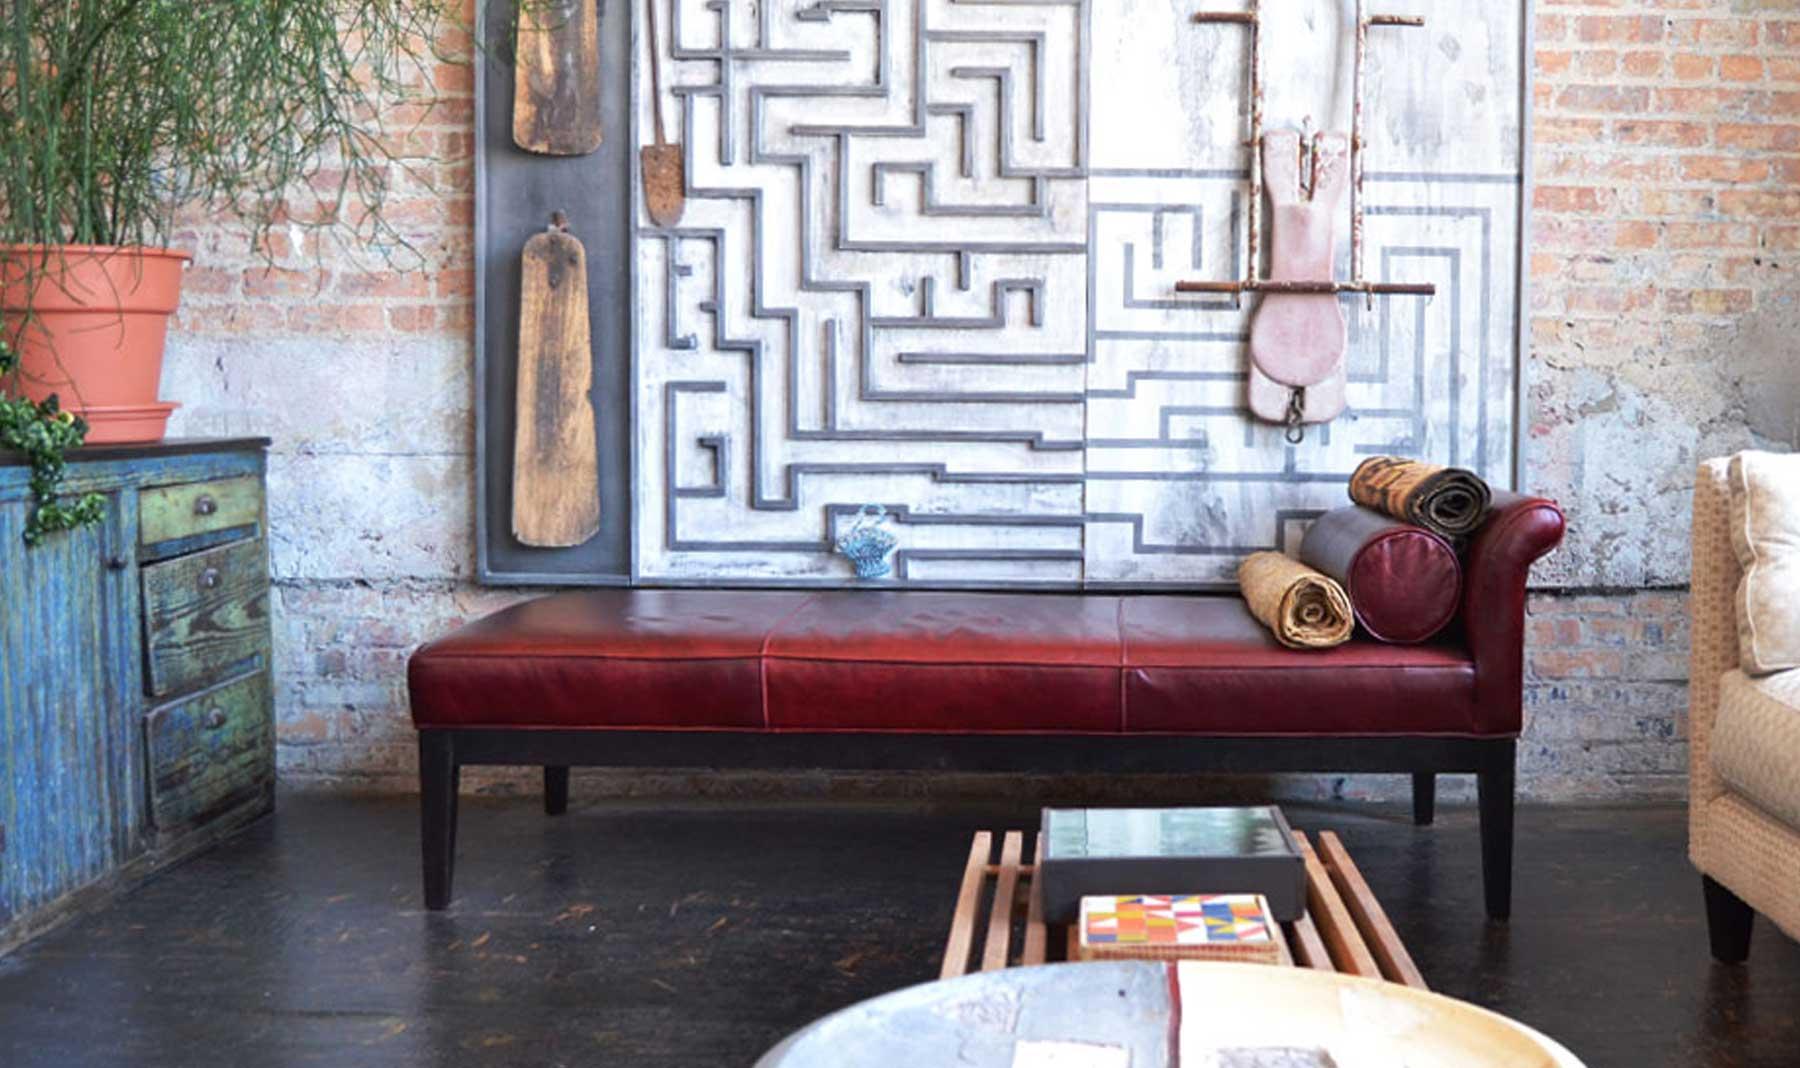 Artist Nick Cave's burgundy sofa